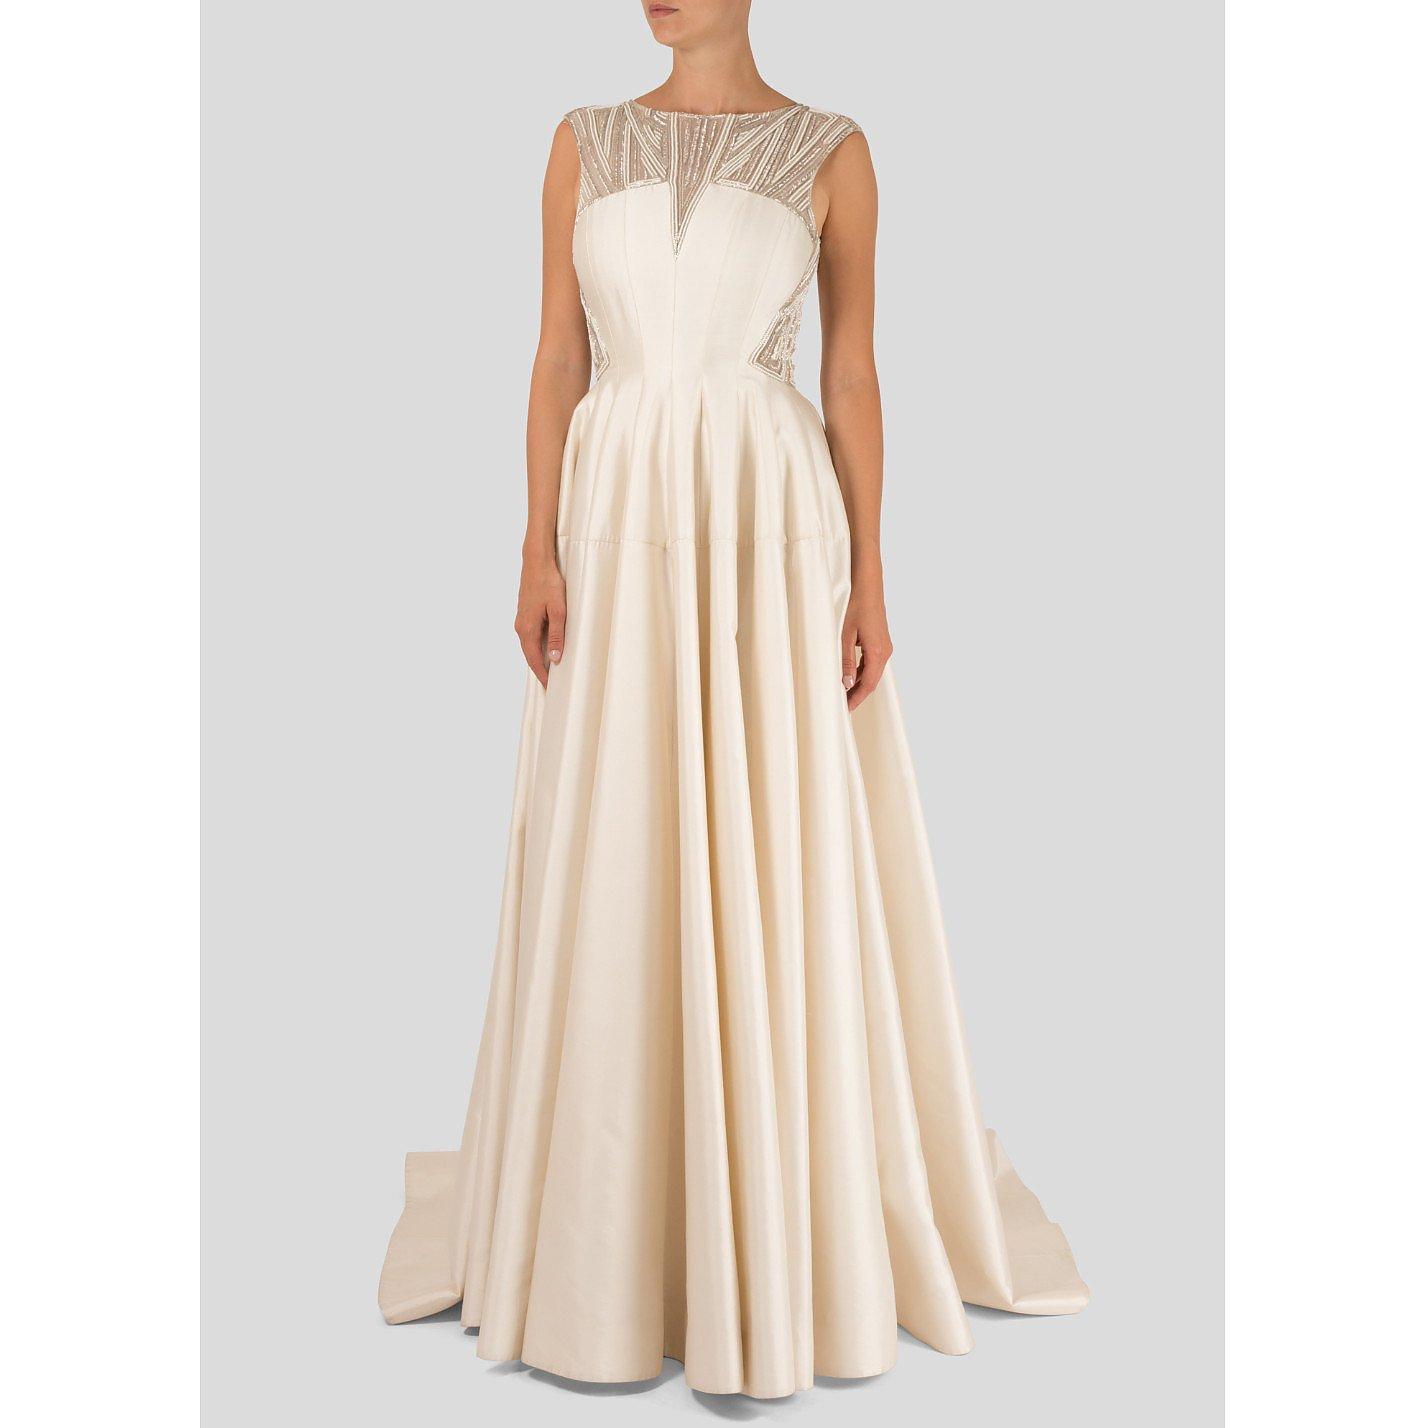 Amanda Wakeley Bridal The Ivy Bridal Dress